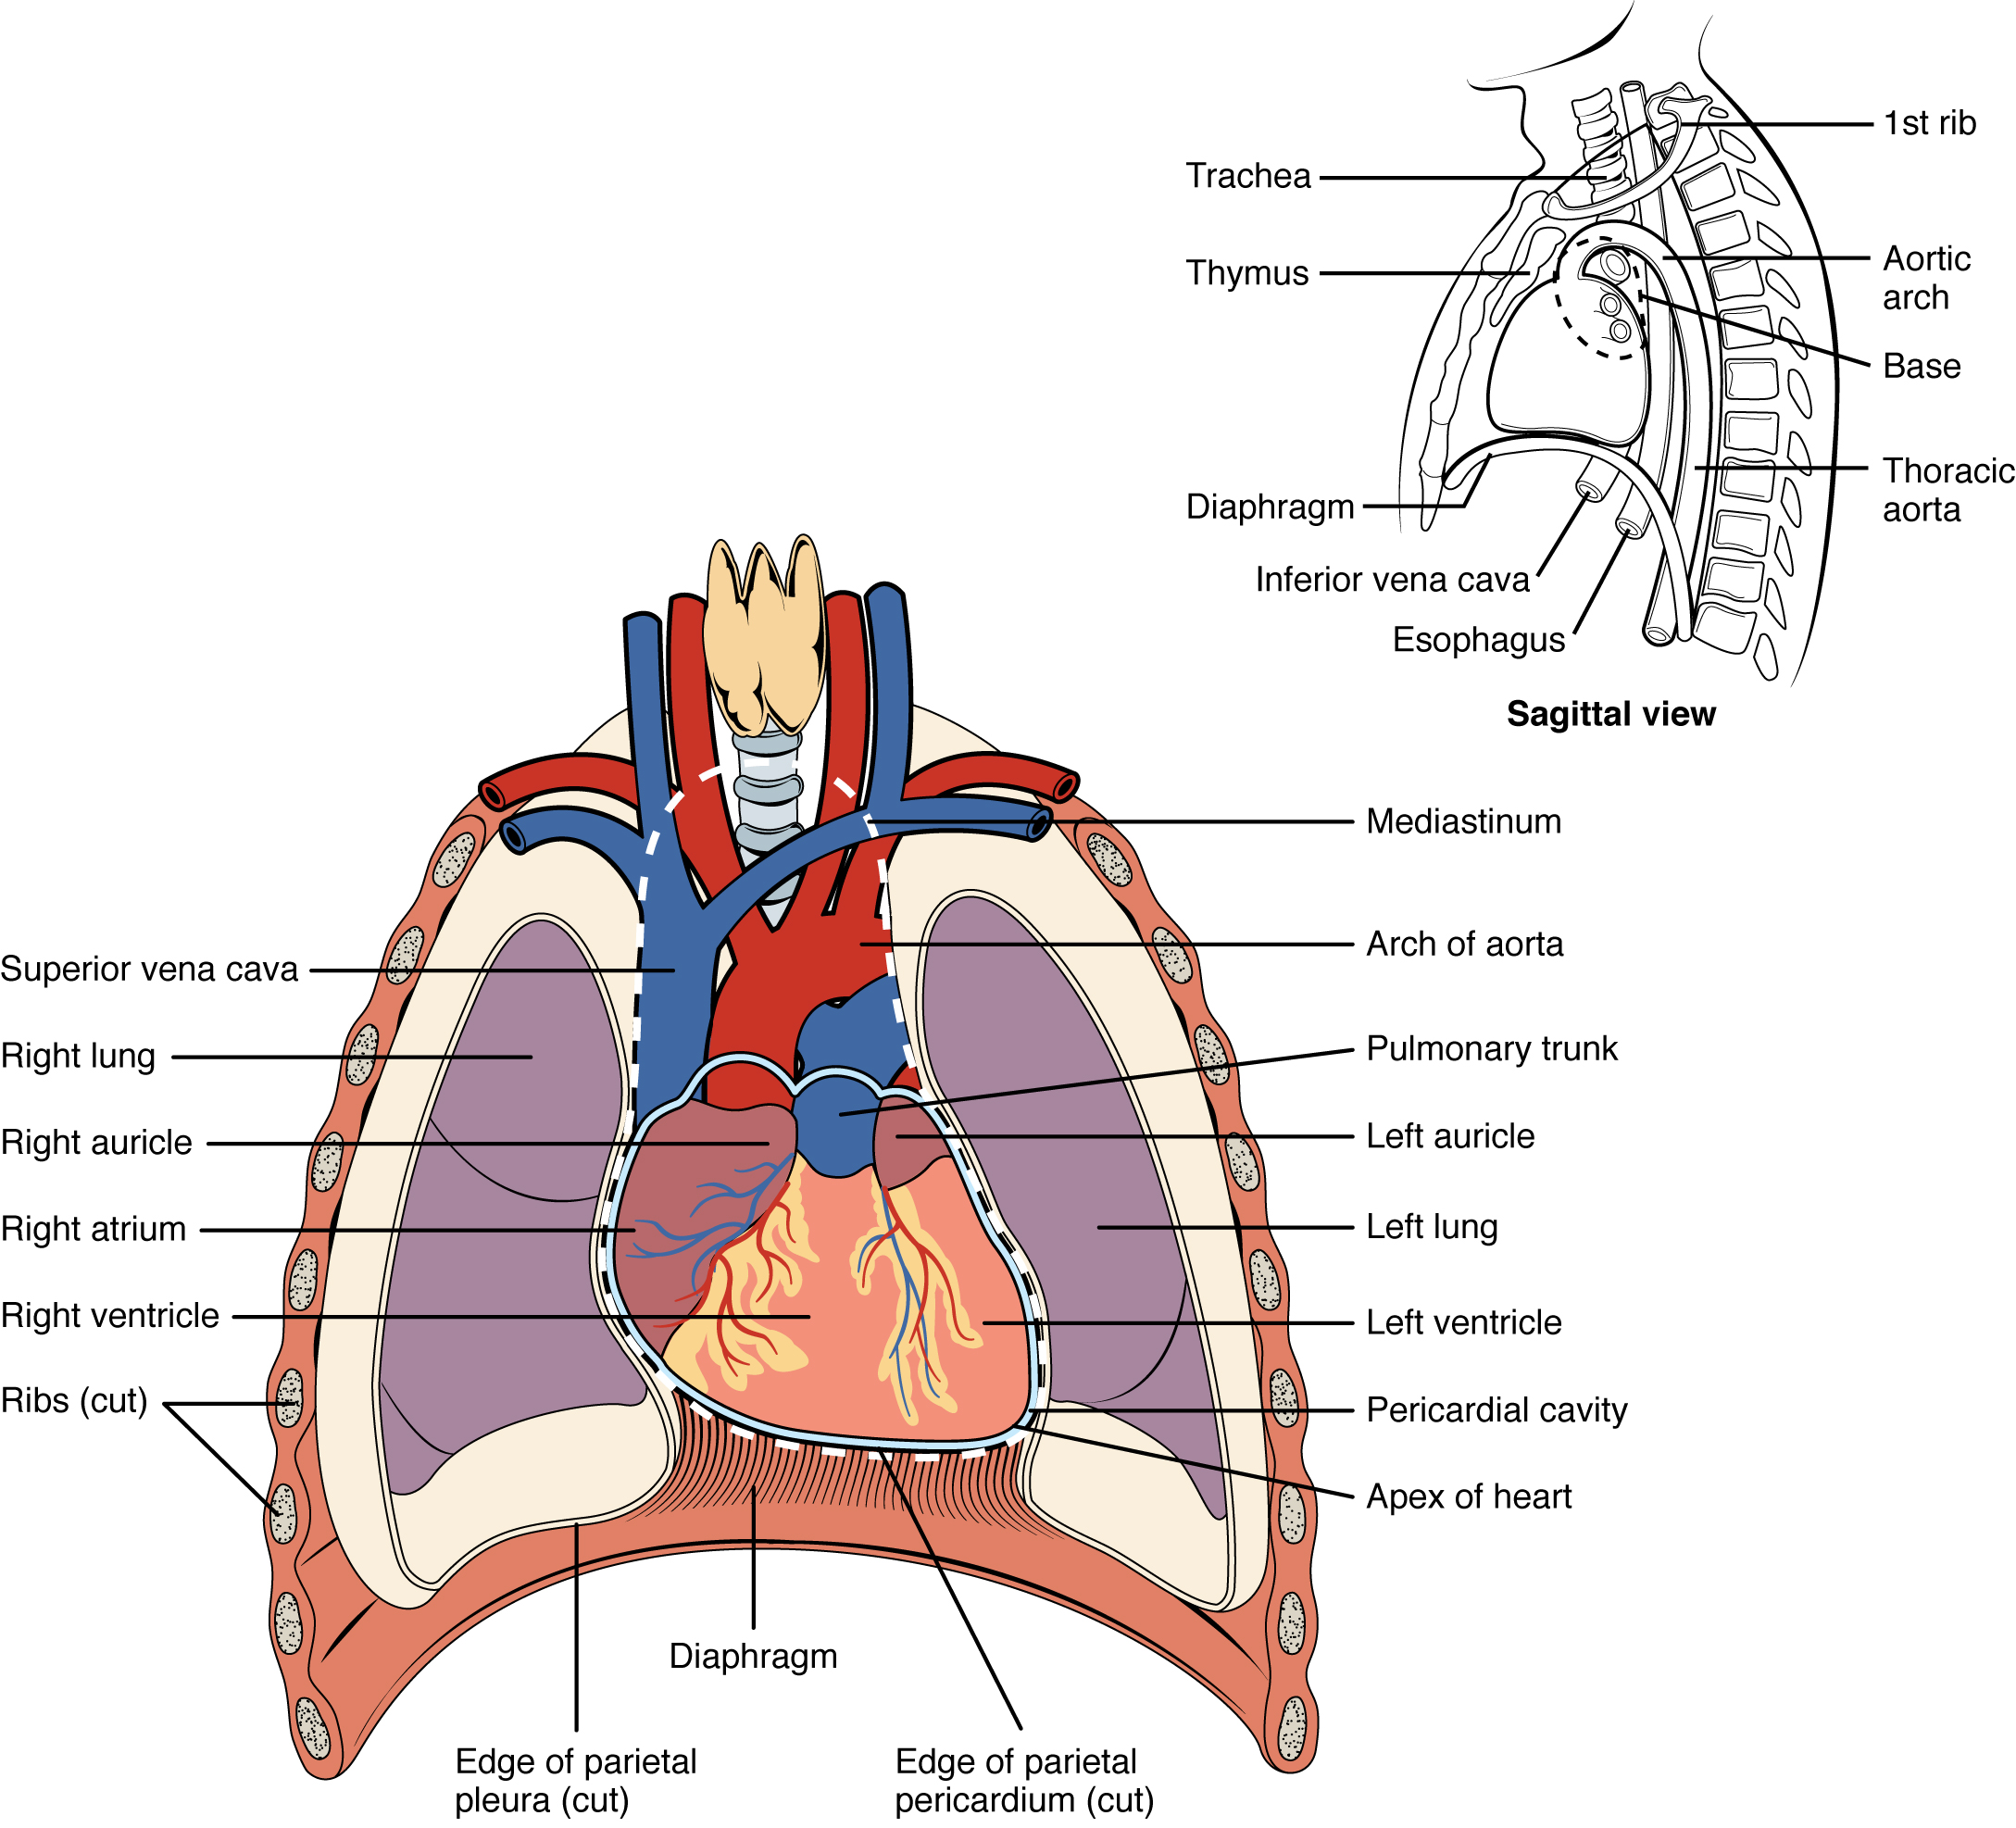 Heart Anatomy Wiki Images - human body anatomy